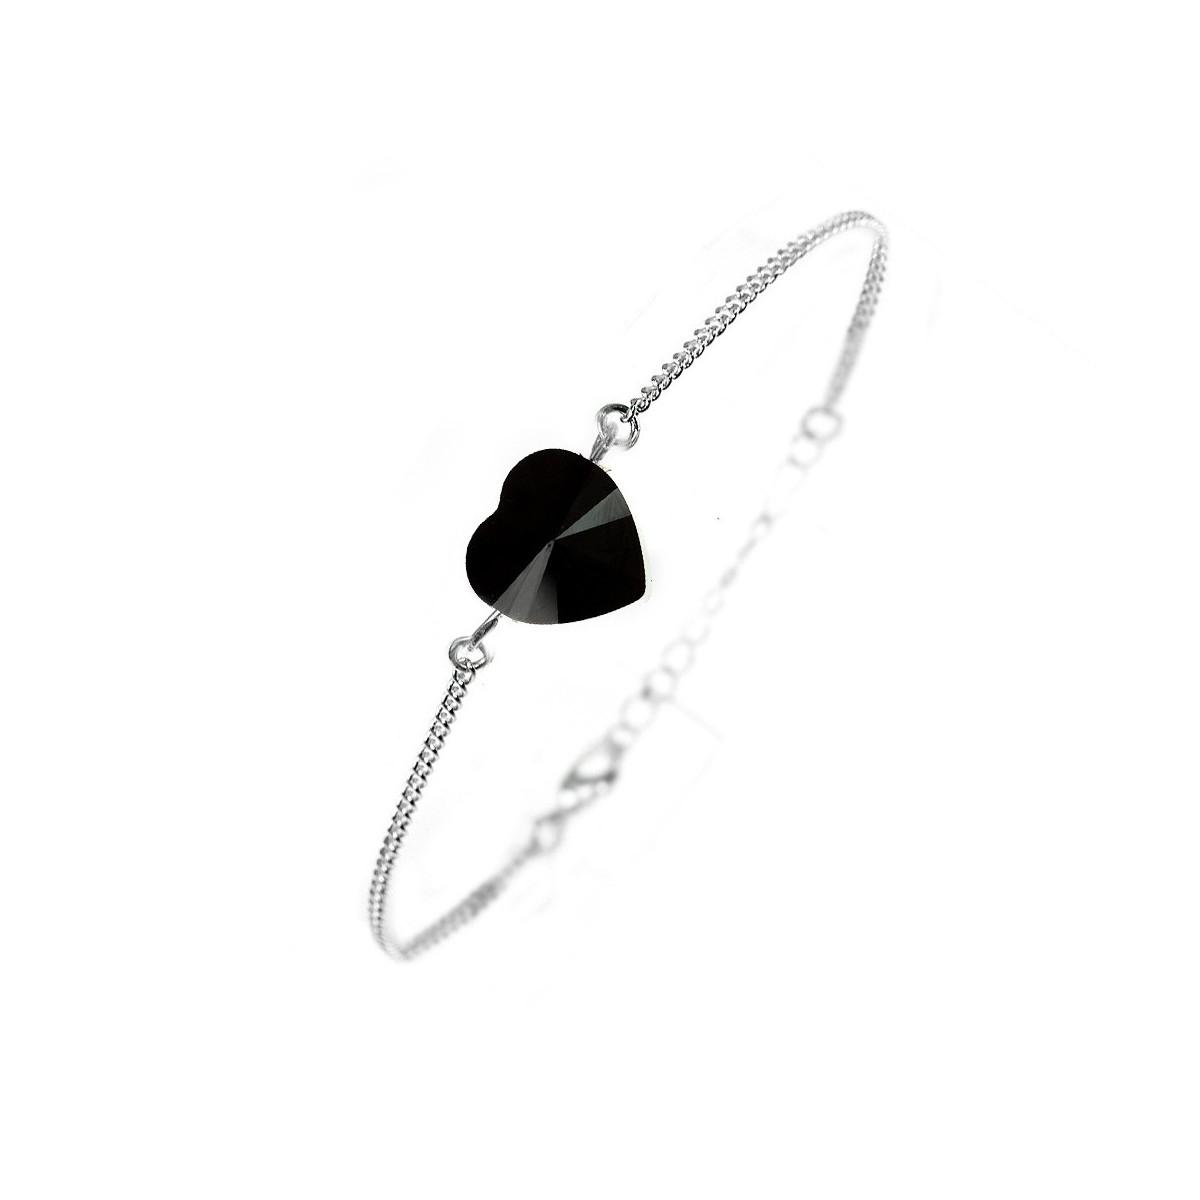 Bracelet argenté So Charm orné d'un coeur noir made with crystal from Swarovski